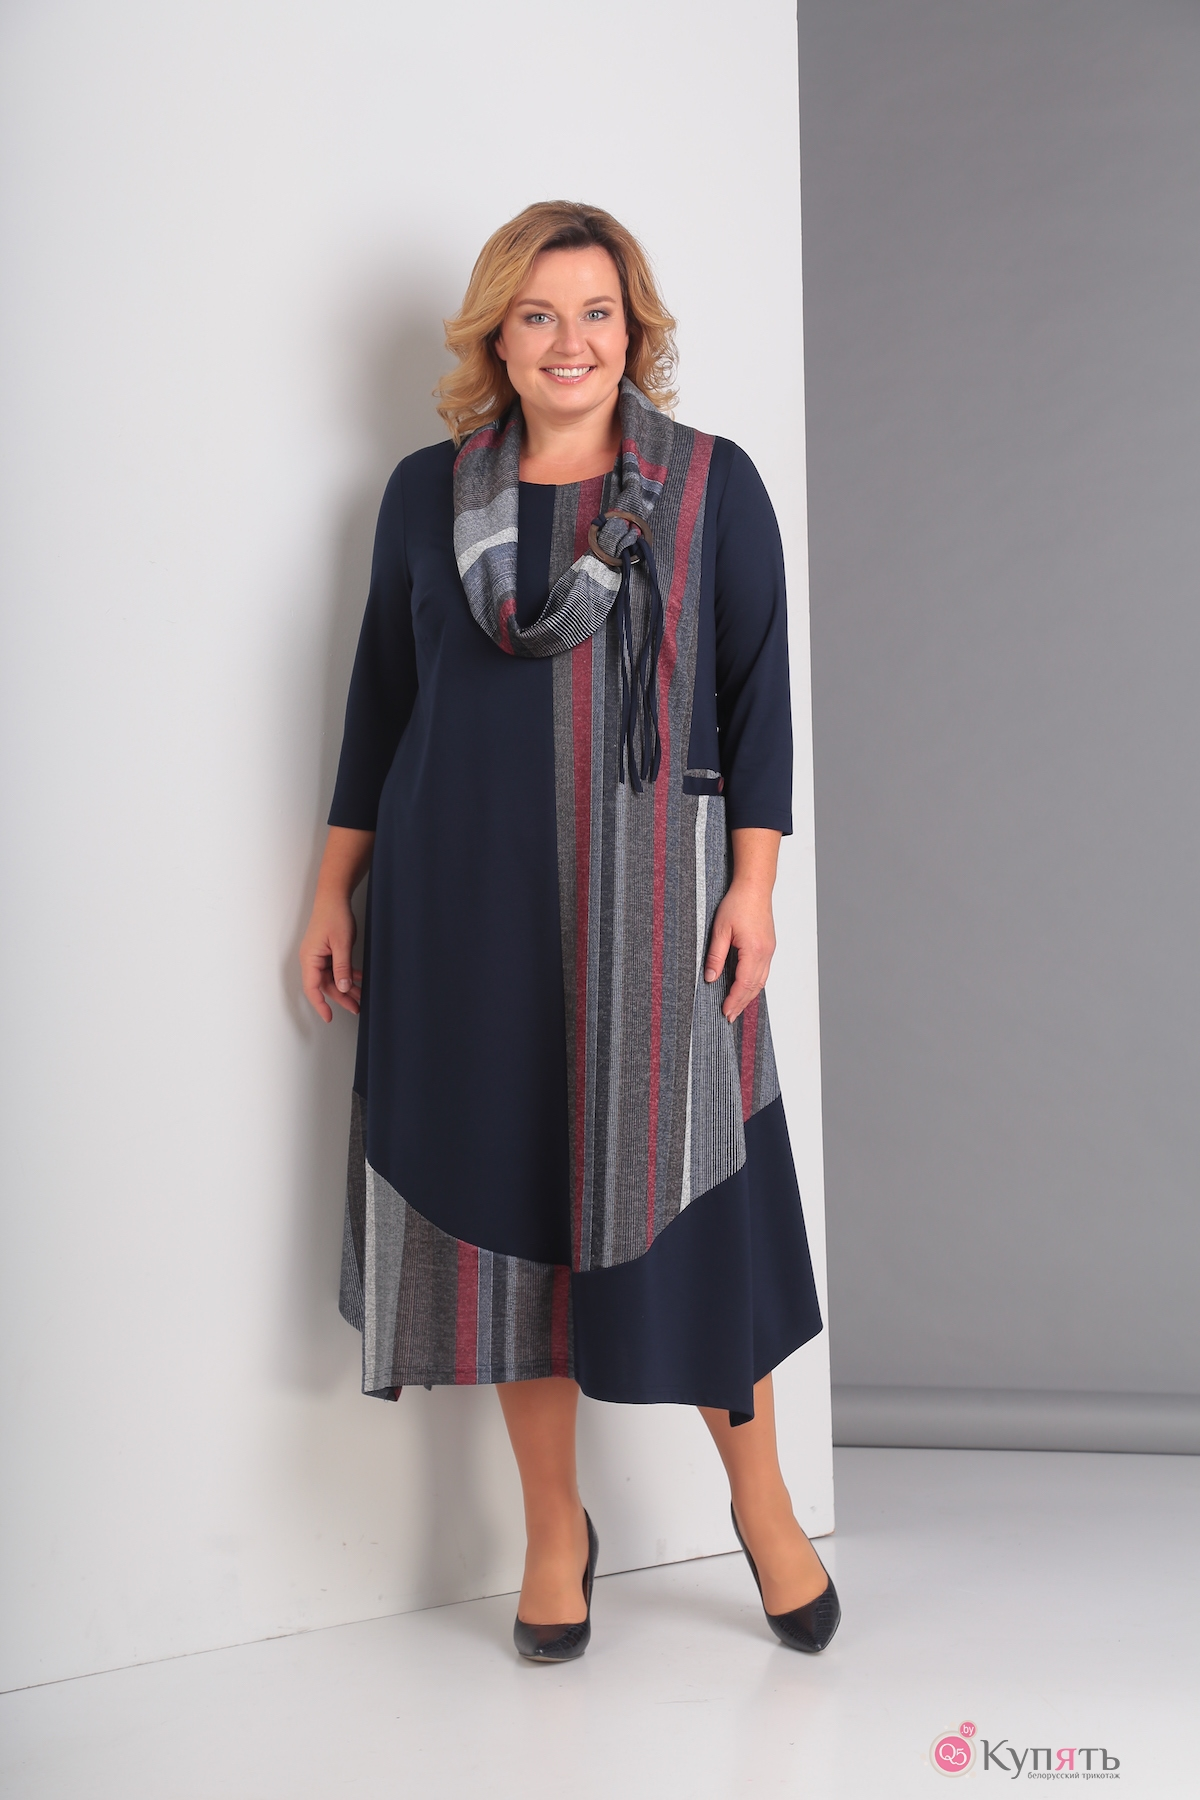 8a783a3f8557d0a Платье Novella Sharm (Альгранда) 3099 - интернет-магазин женской ...